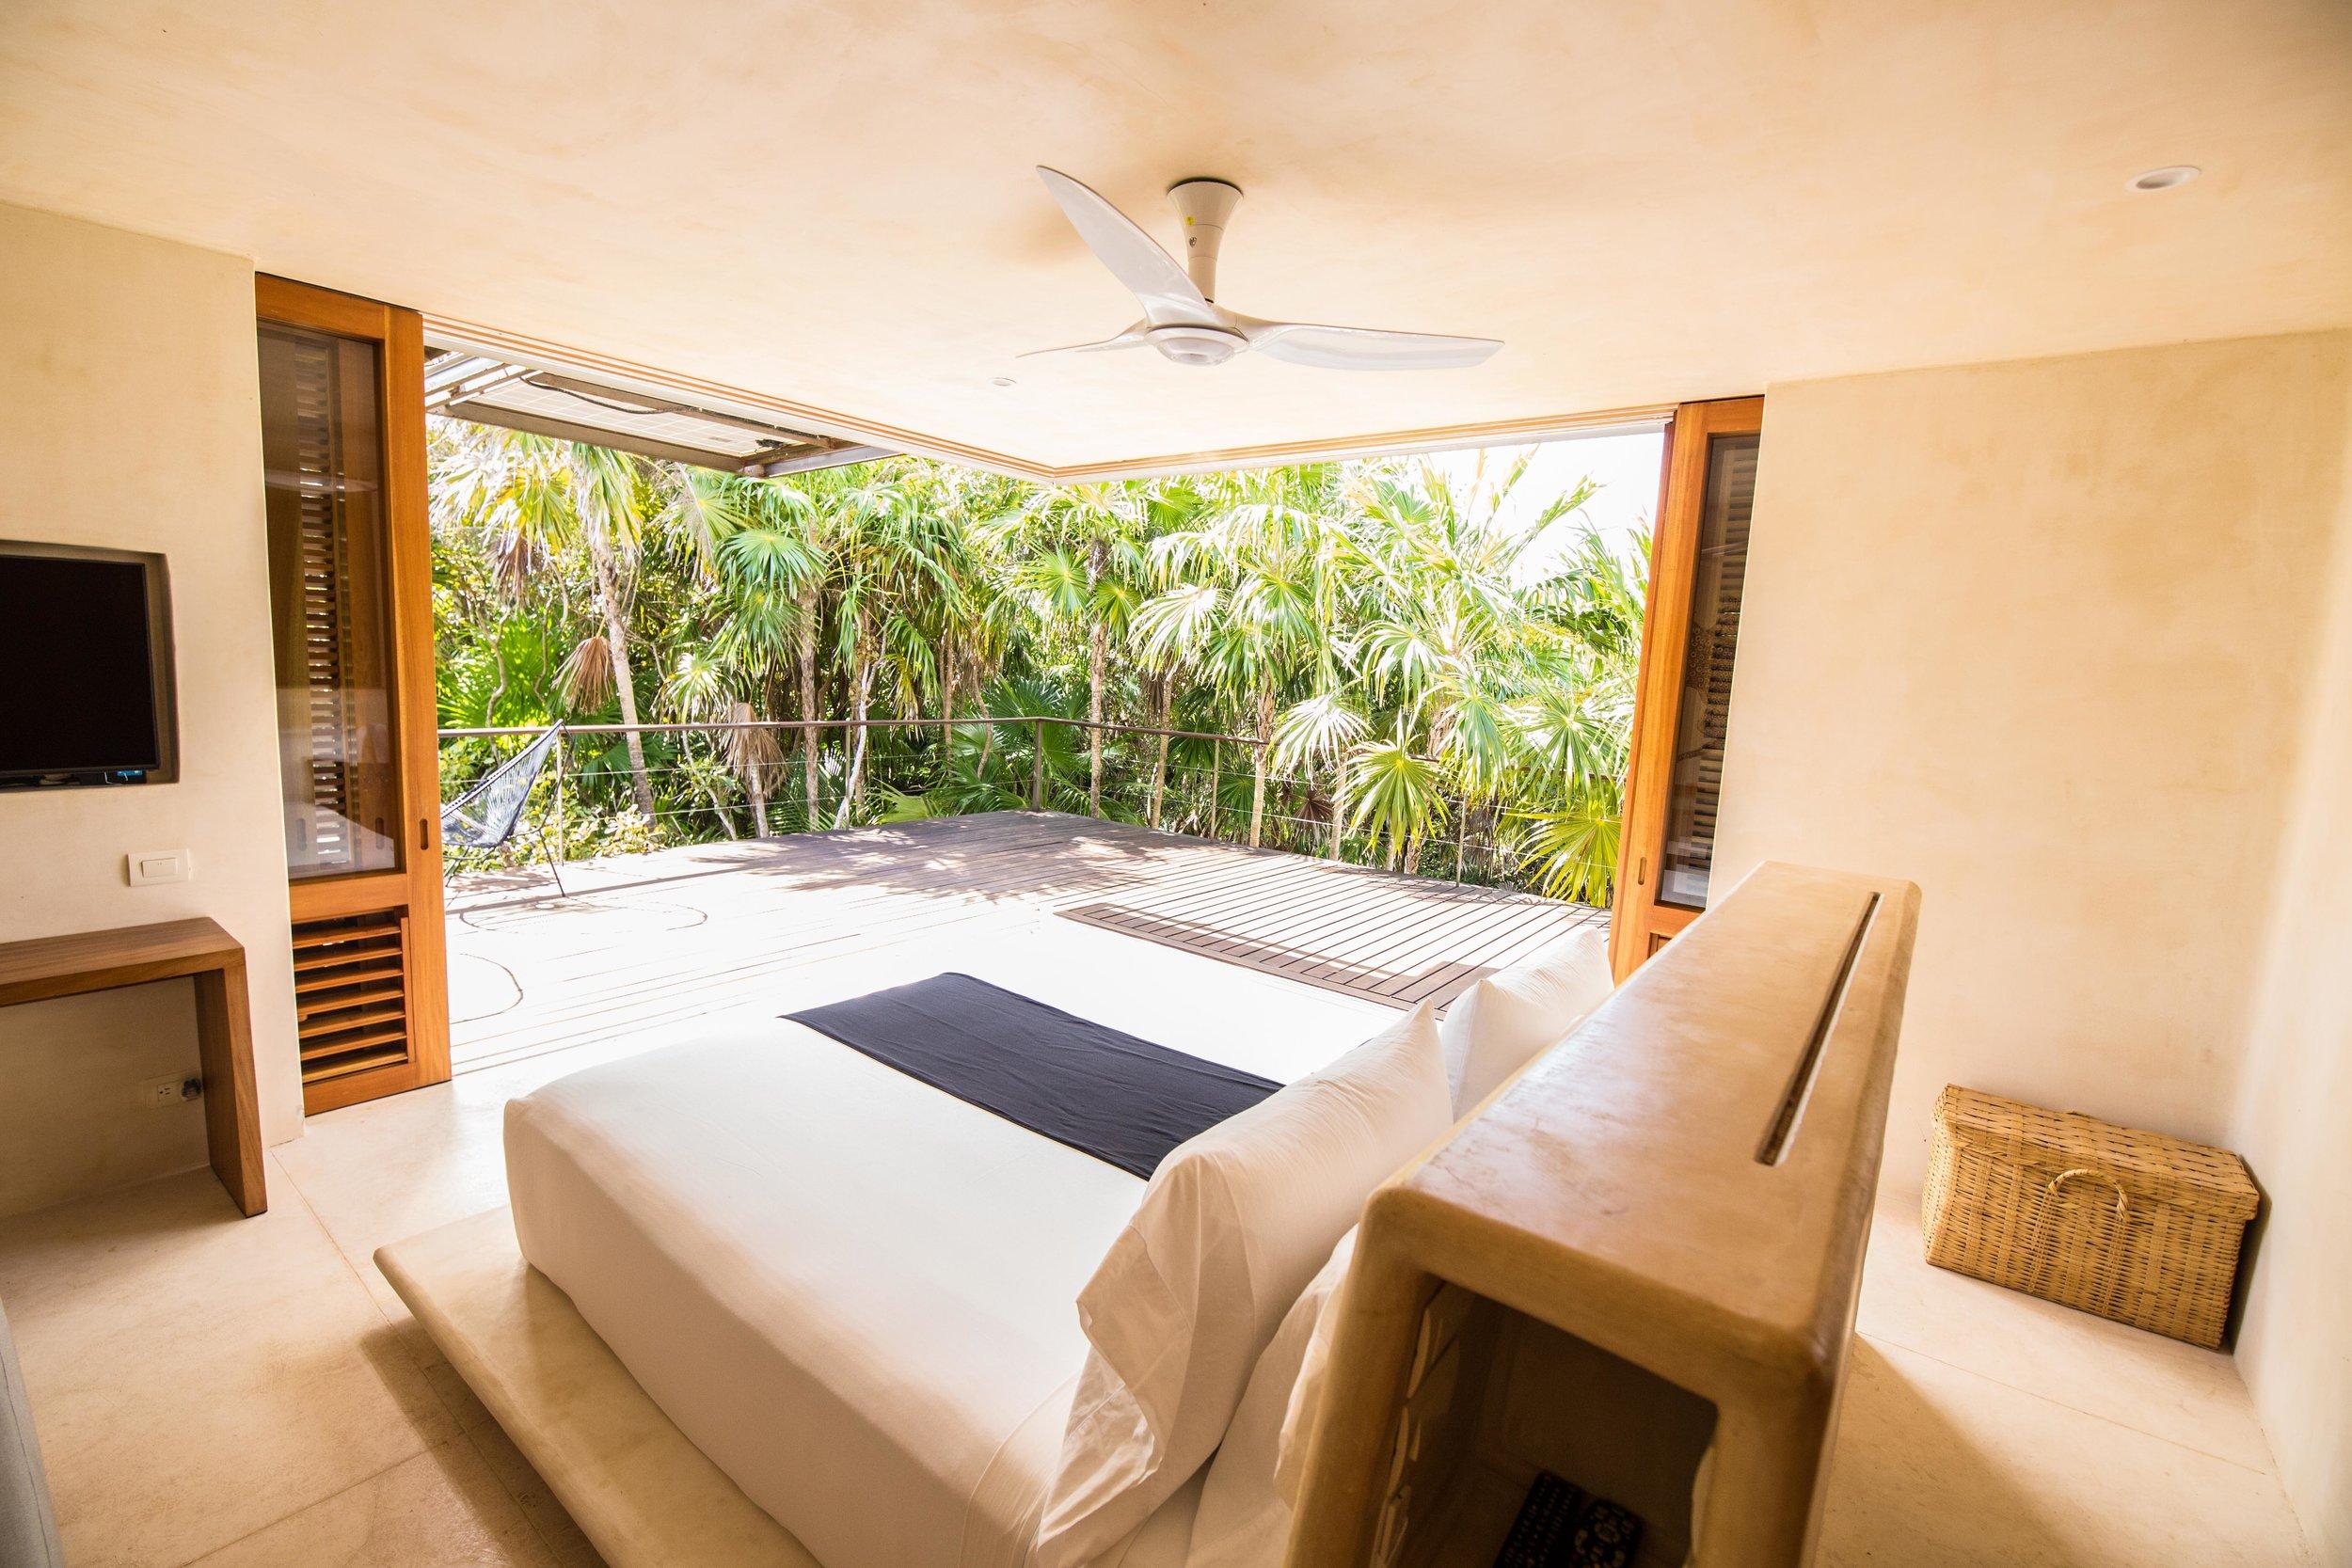 IMG_1946 - Na'iik - Octopus bedroom and terrace - © Nico T.jpg